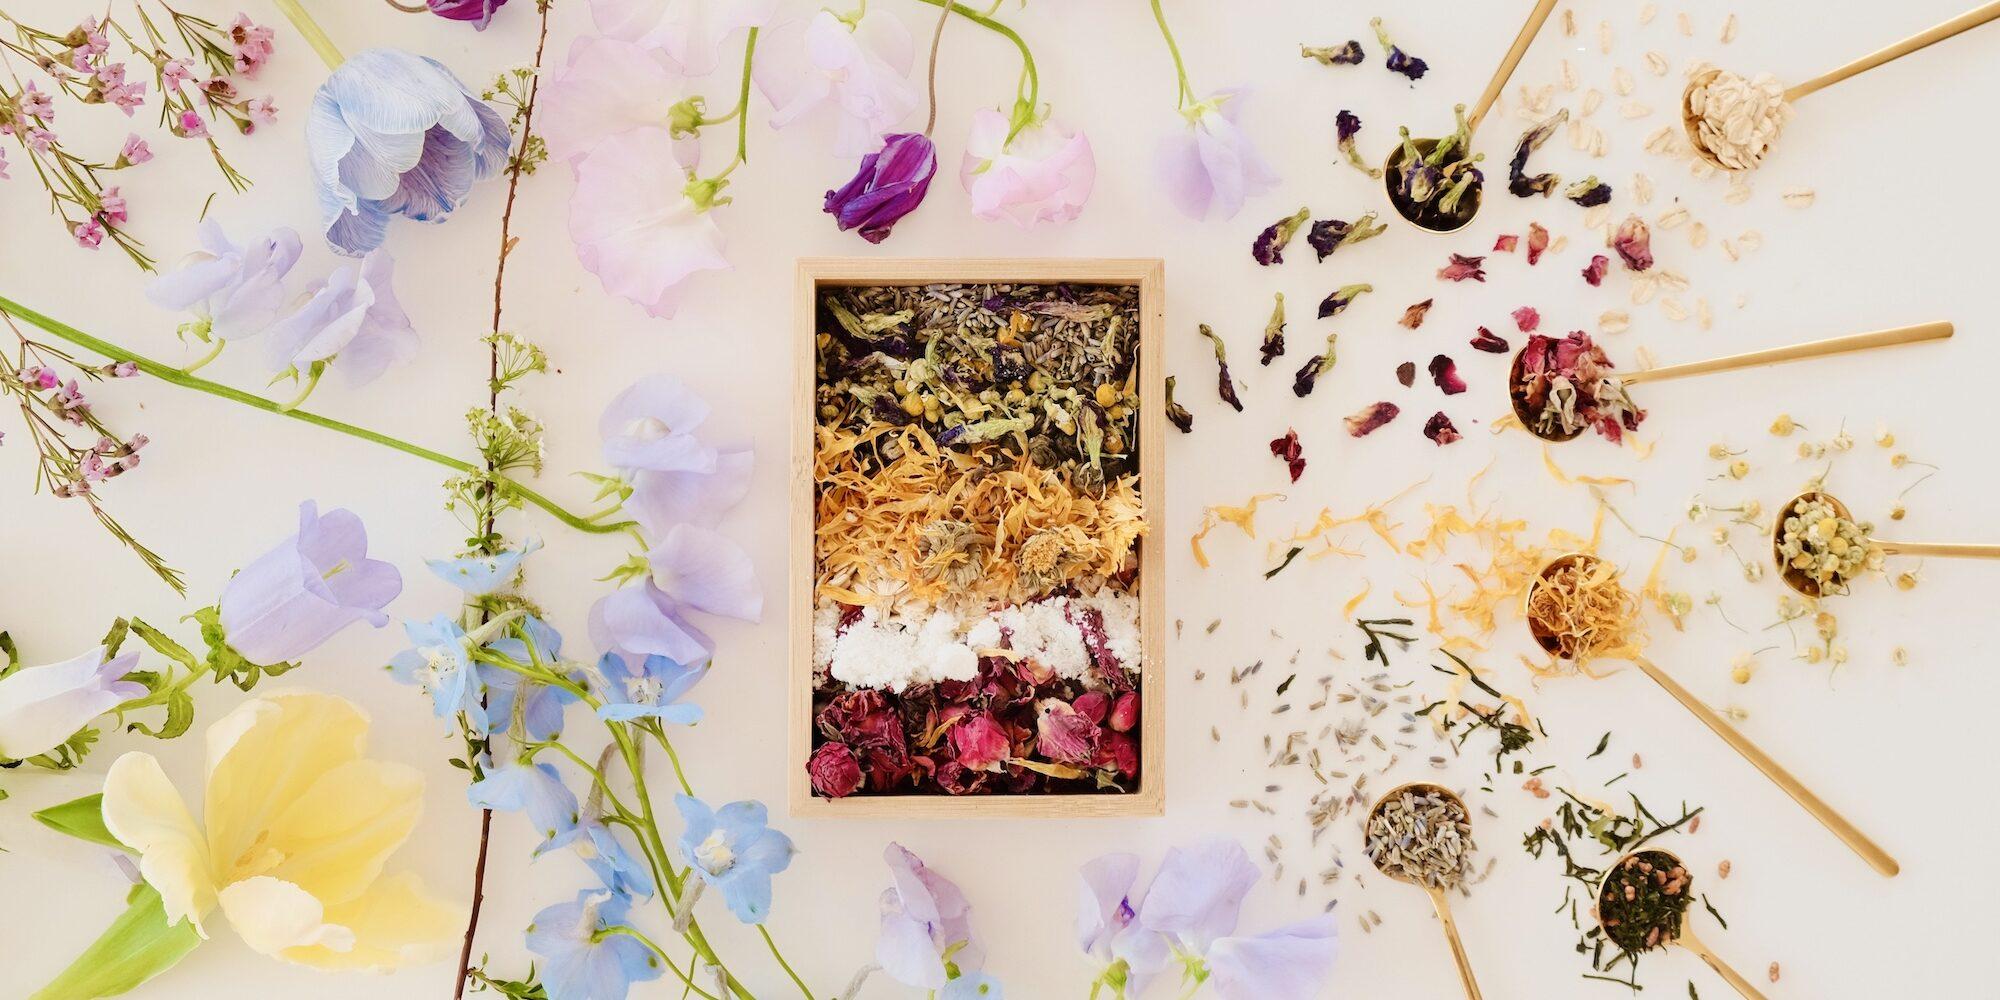 Viral Tea-Based Bath Product Brand Inoki Bathhouse May Be The Calmest Thing On TikTok